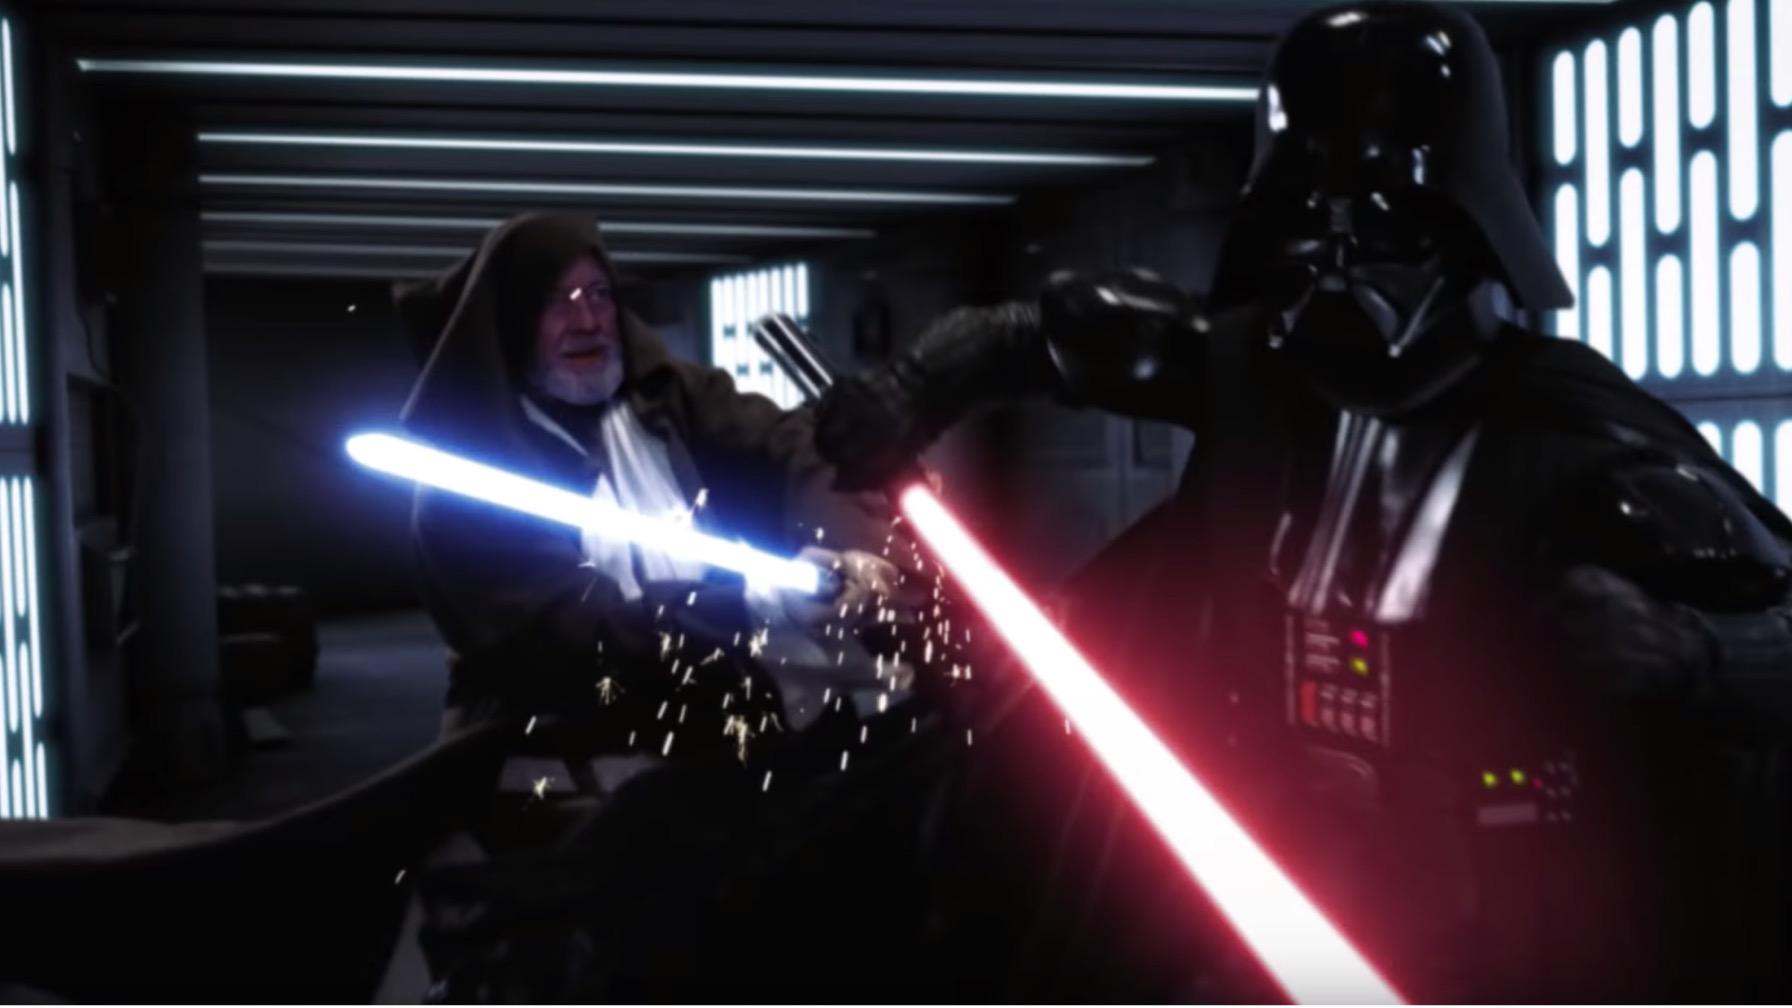 Re-Imagined Obi-Wan vs Darth Scene Is the Duel We Deserve